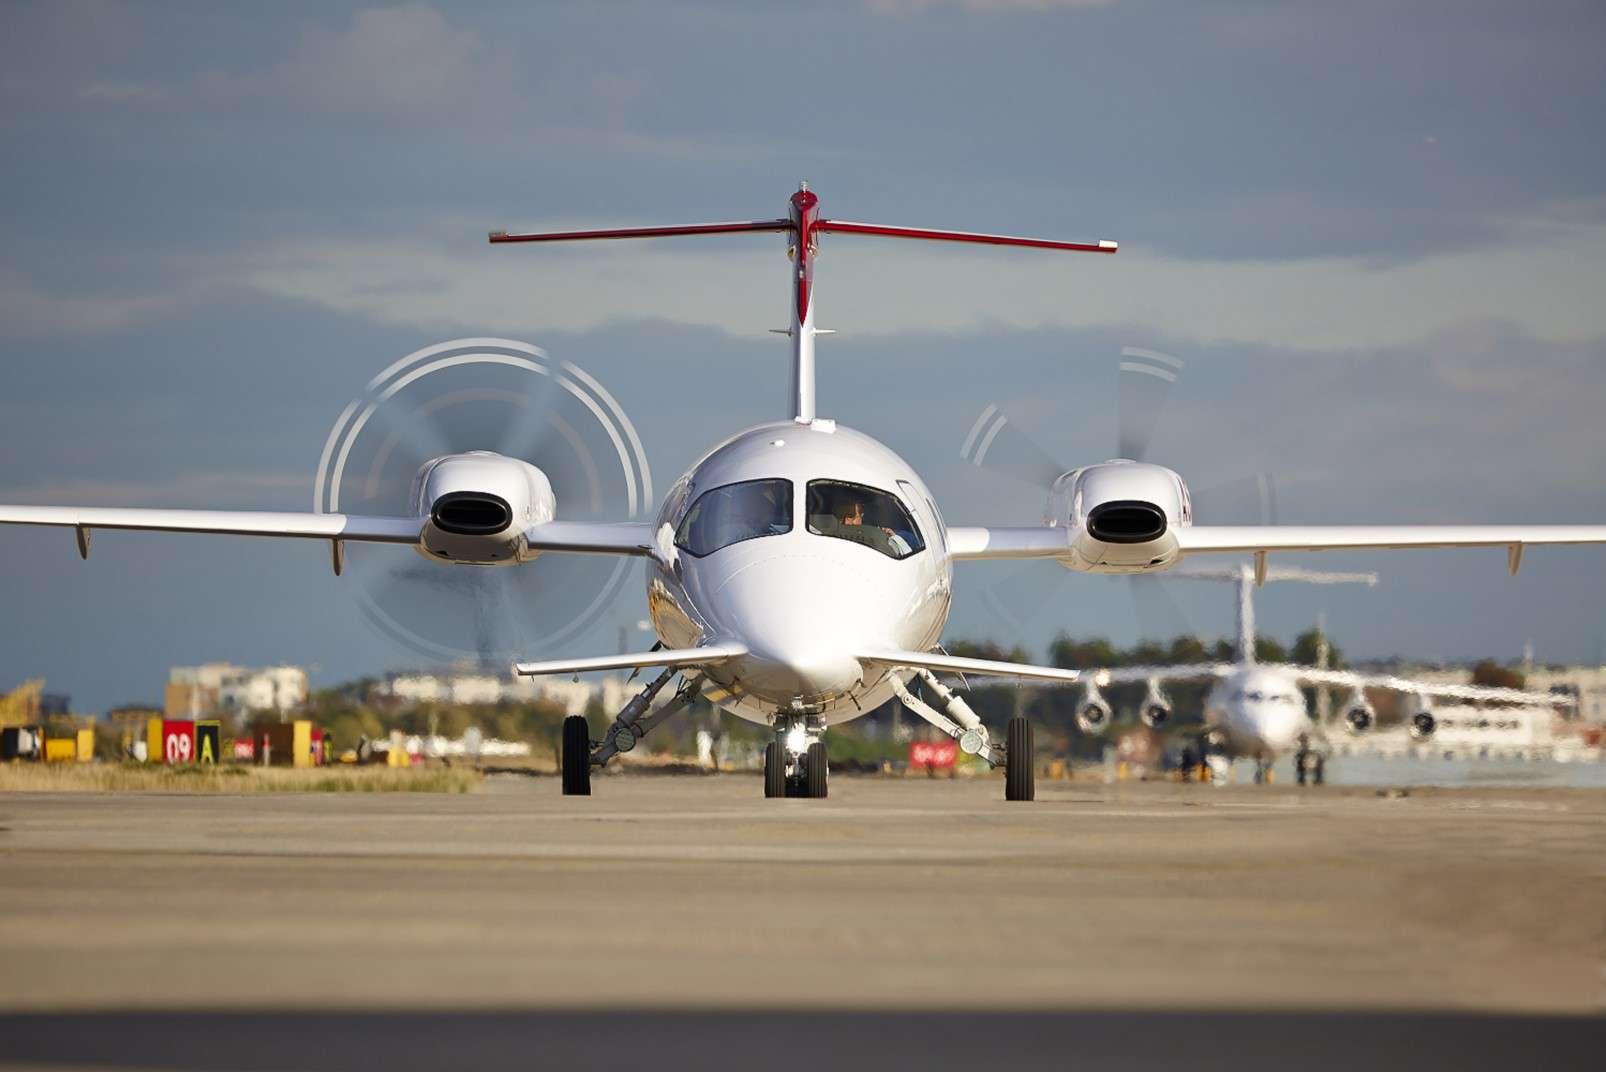 Farnborough International Airshow 16-22 July 2018, Piaggio Avanti EVO turboprop